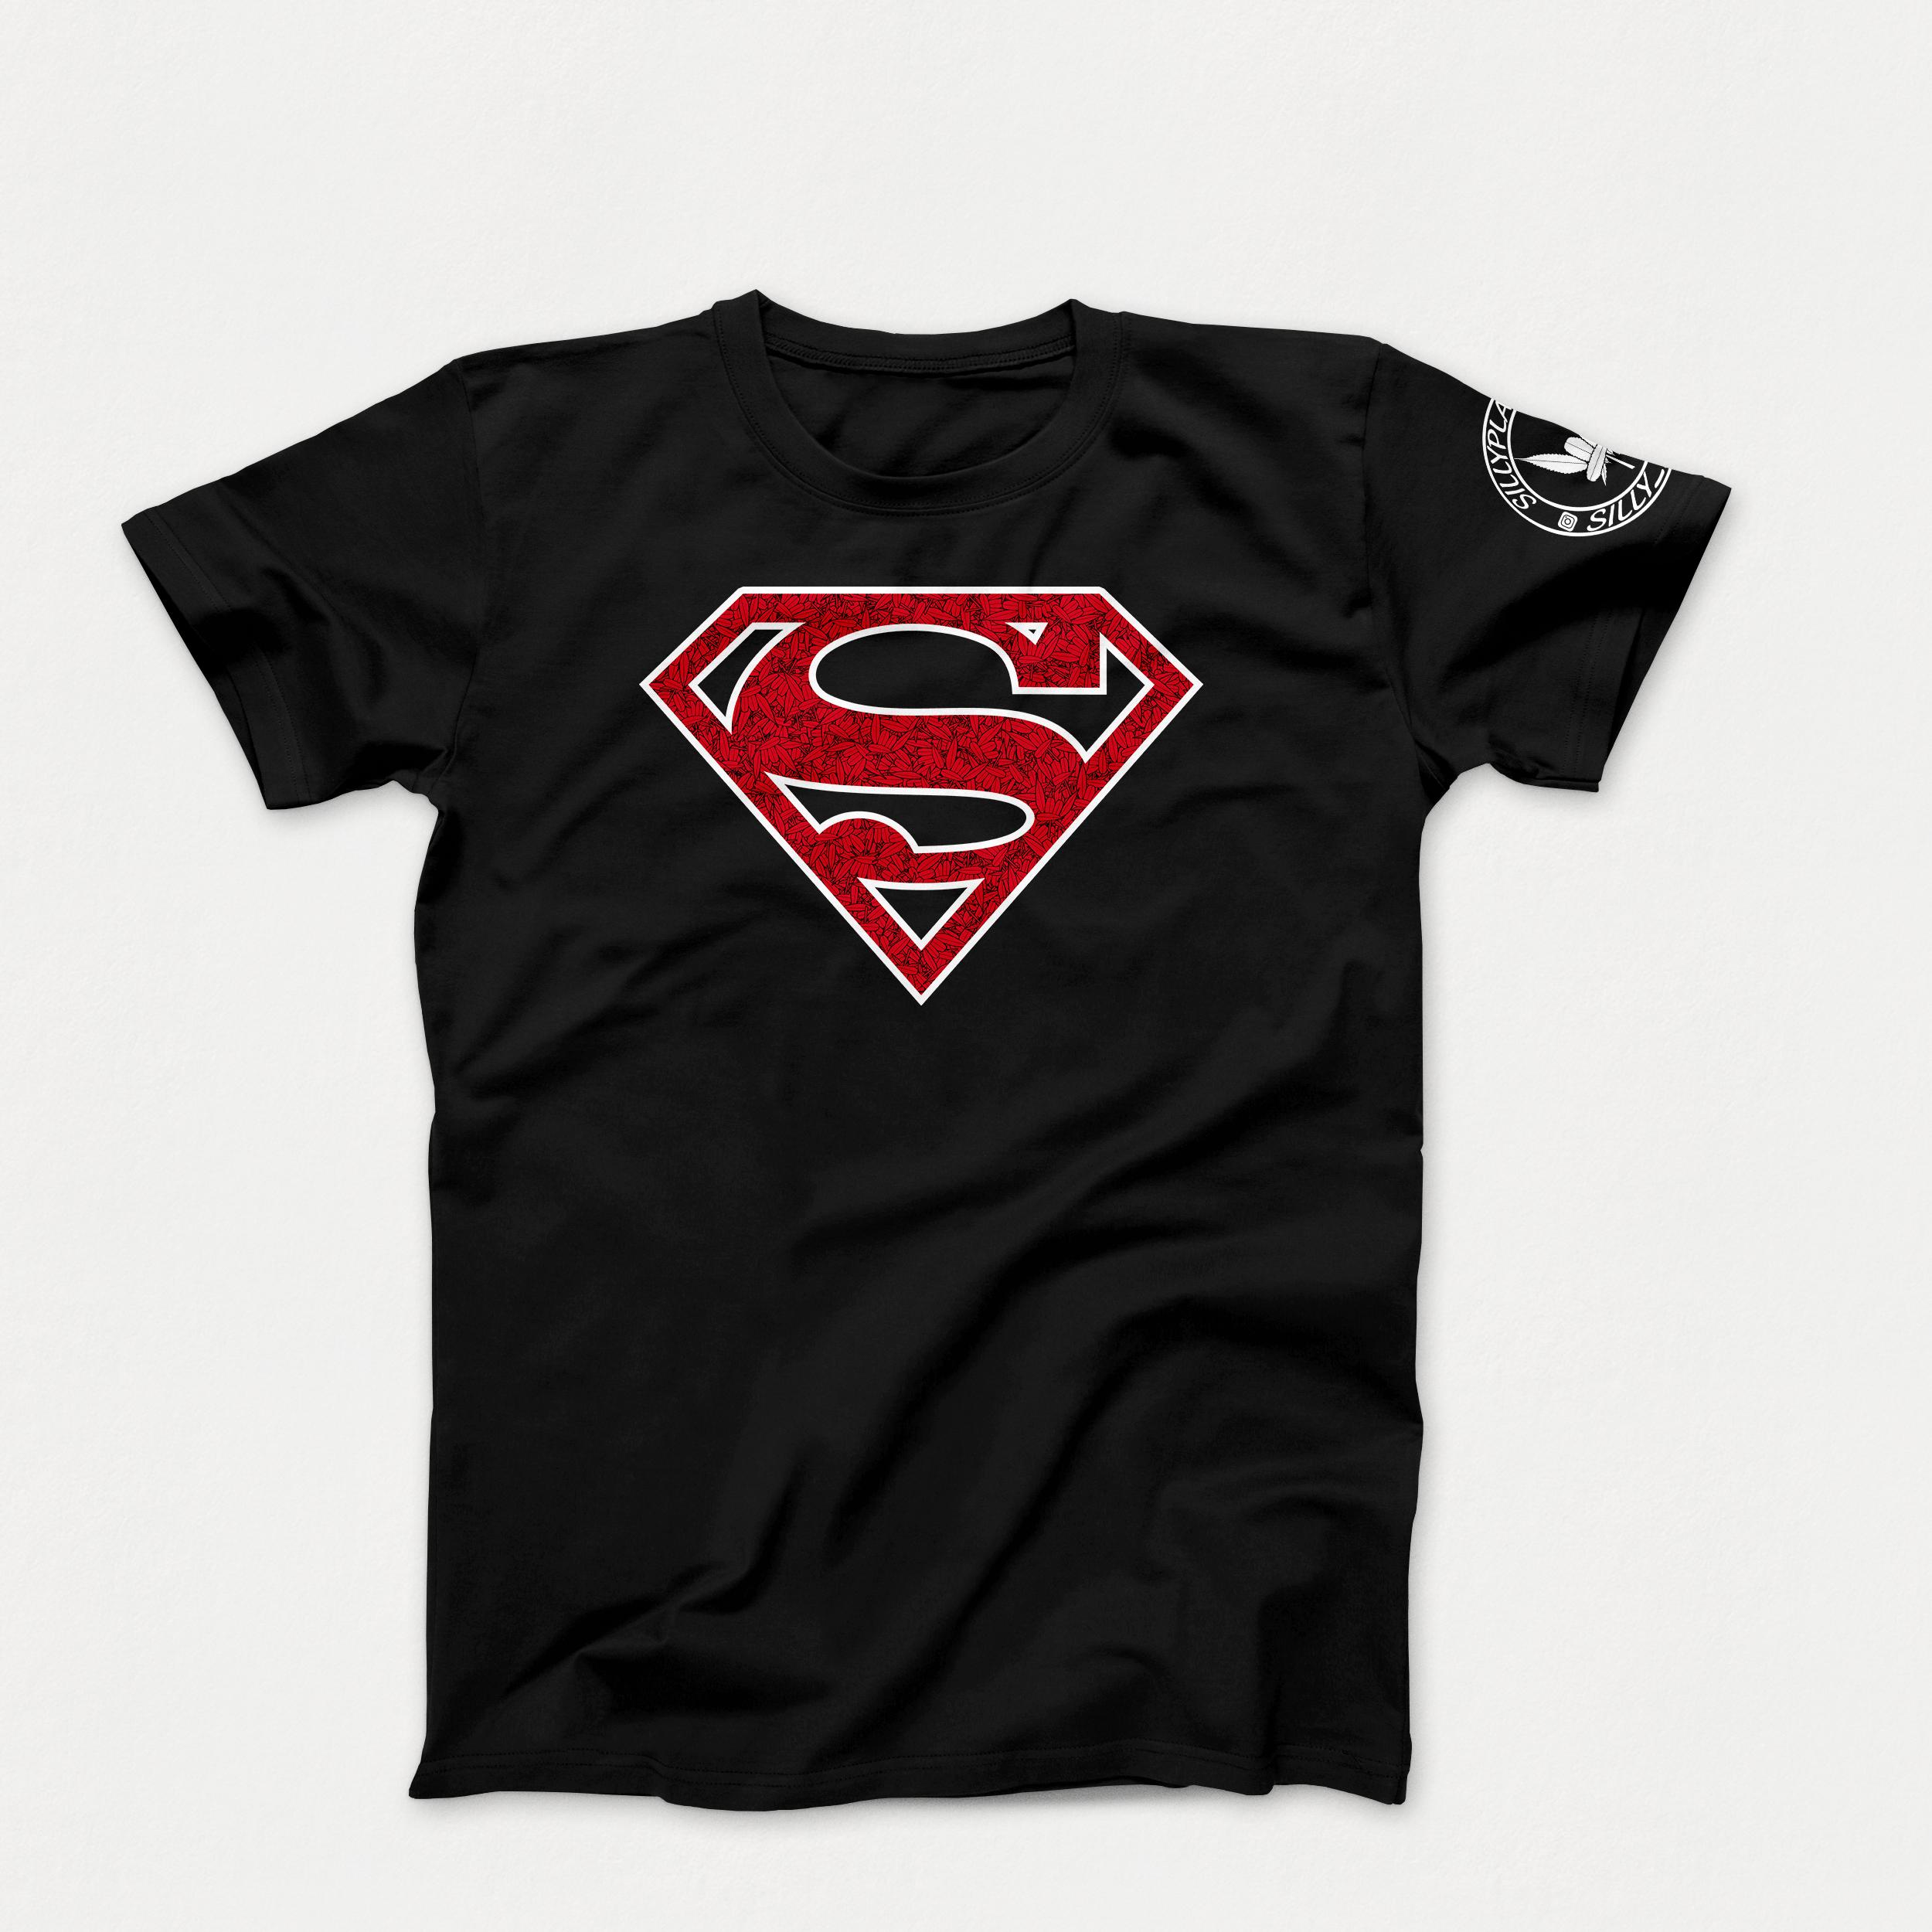 Sativa Man Black T-Shirt Mockup Template.jpg